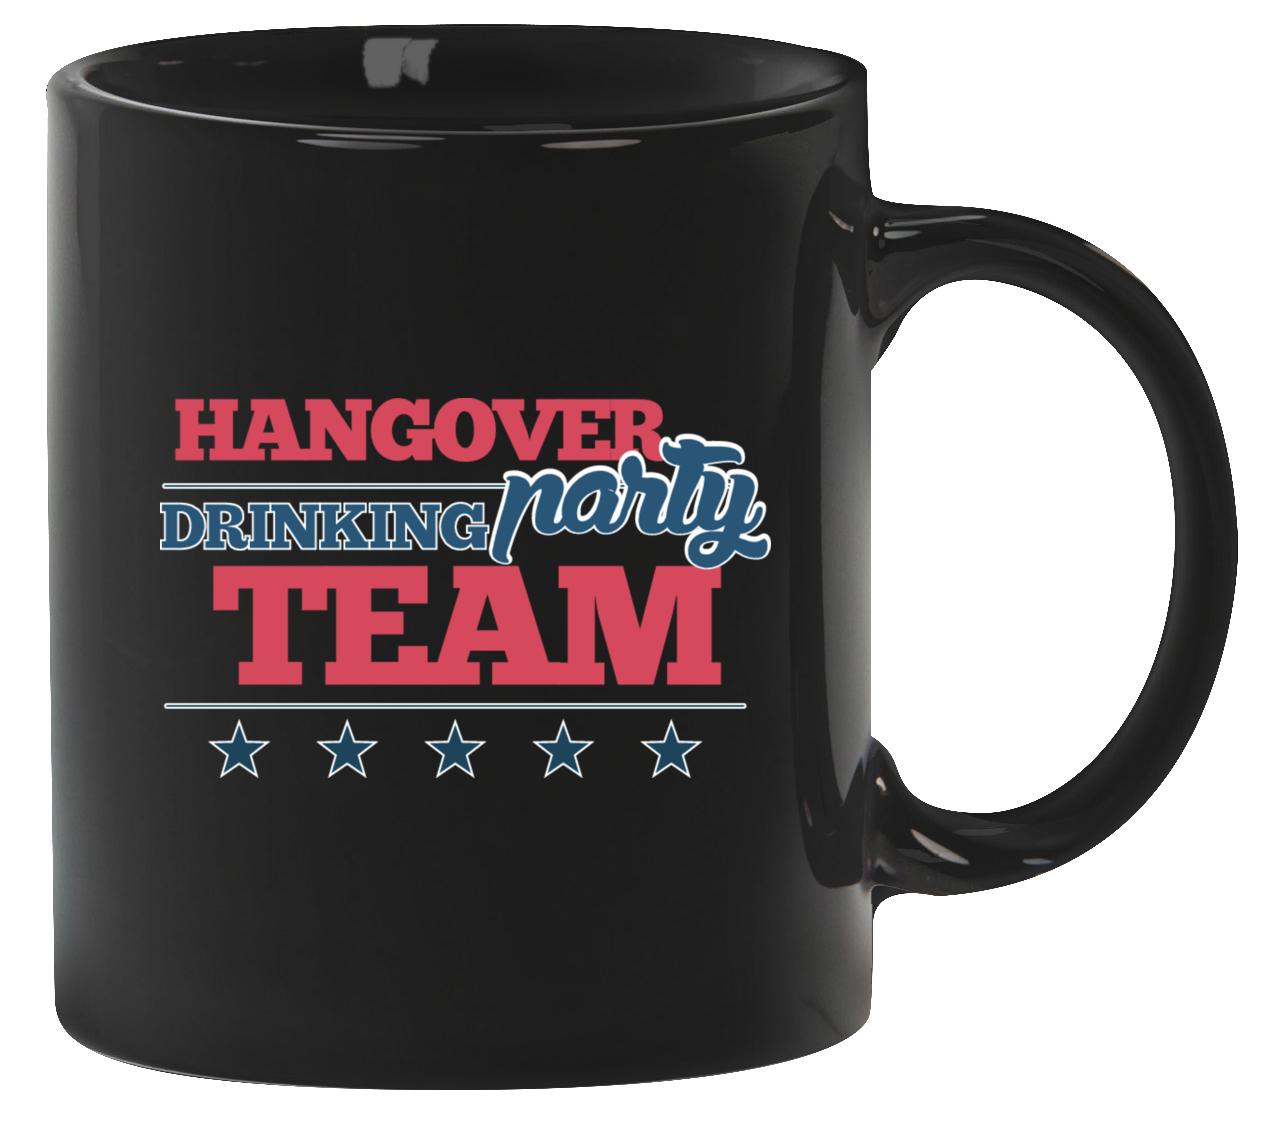 cc52f3021c9302 Hangover Party Drinking Team Tasse | Accessoires | JGA-König